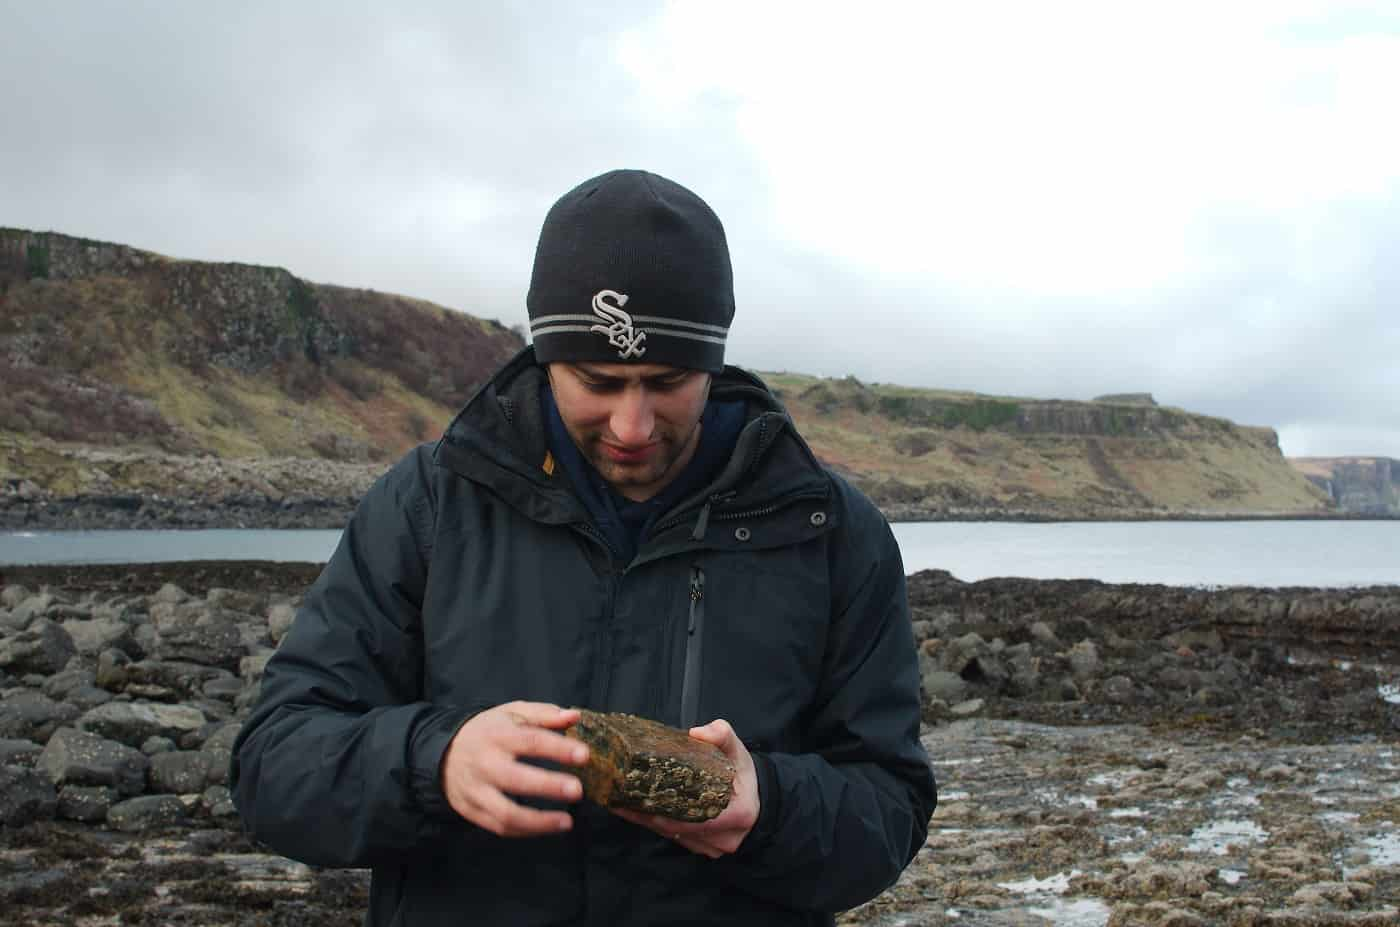 Paleontologist Steve Brusatte inspecting a fossil